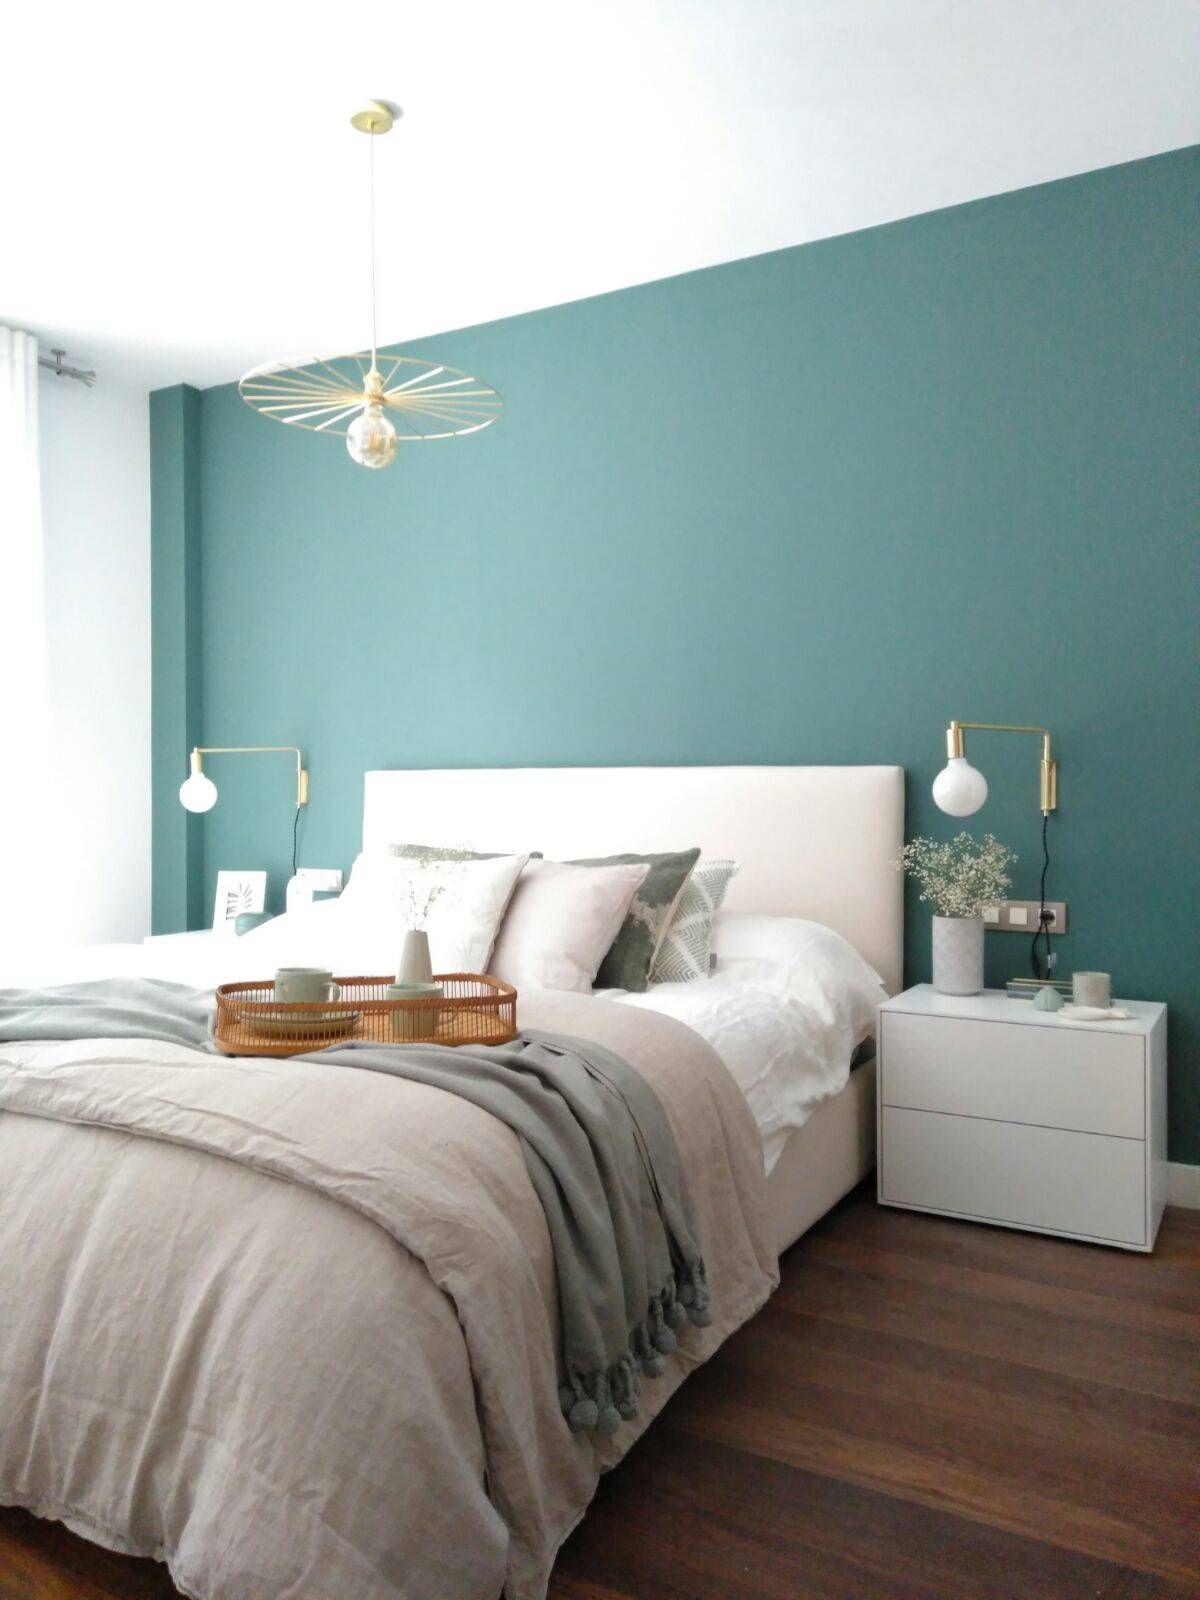 Amor a primera vista en 2019 casas de famosos for Alfombra azul turquesa del dormitorio